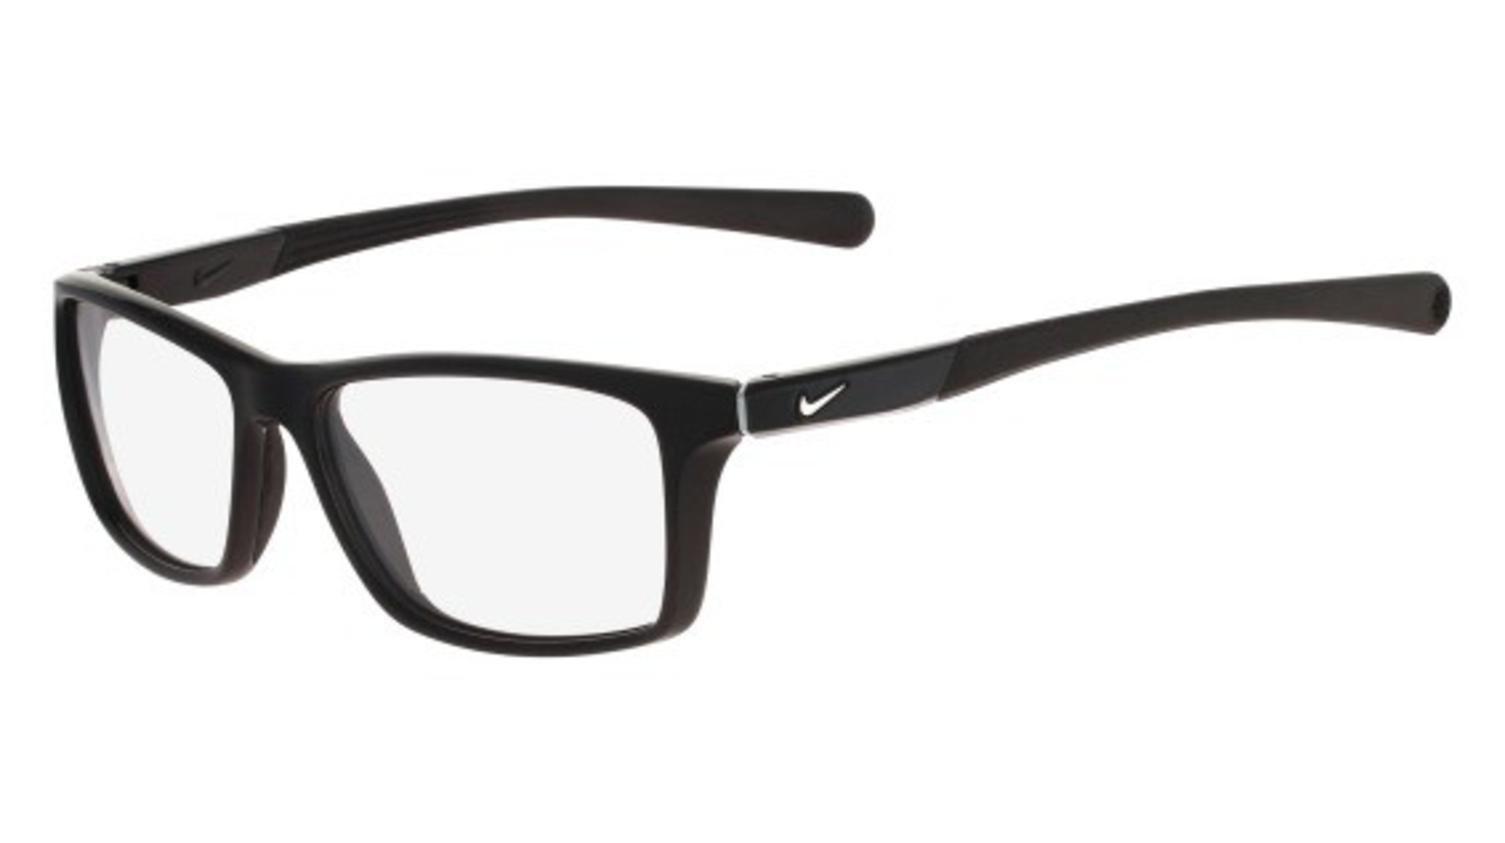 Eyeglasses NIKE 7087 014 BLACK-WOLF GREY